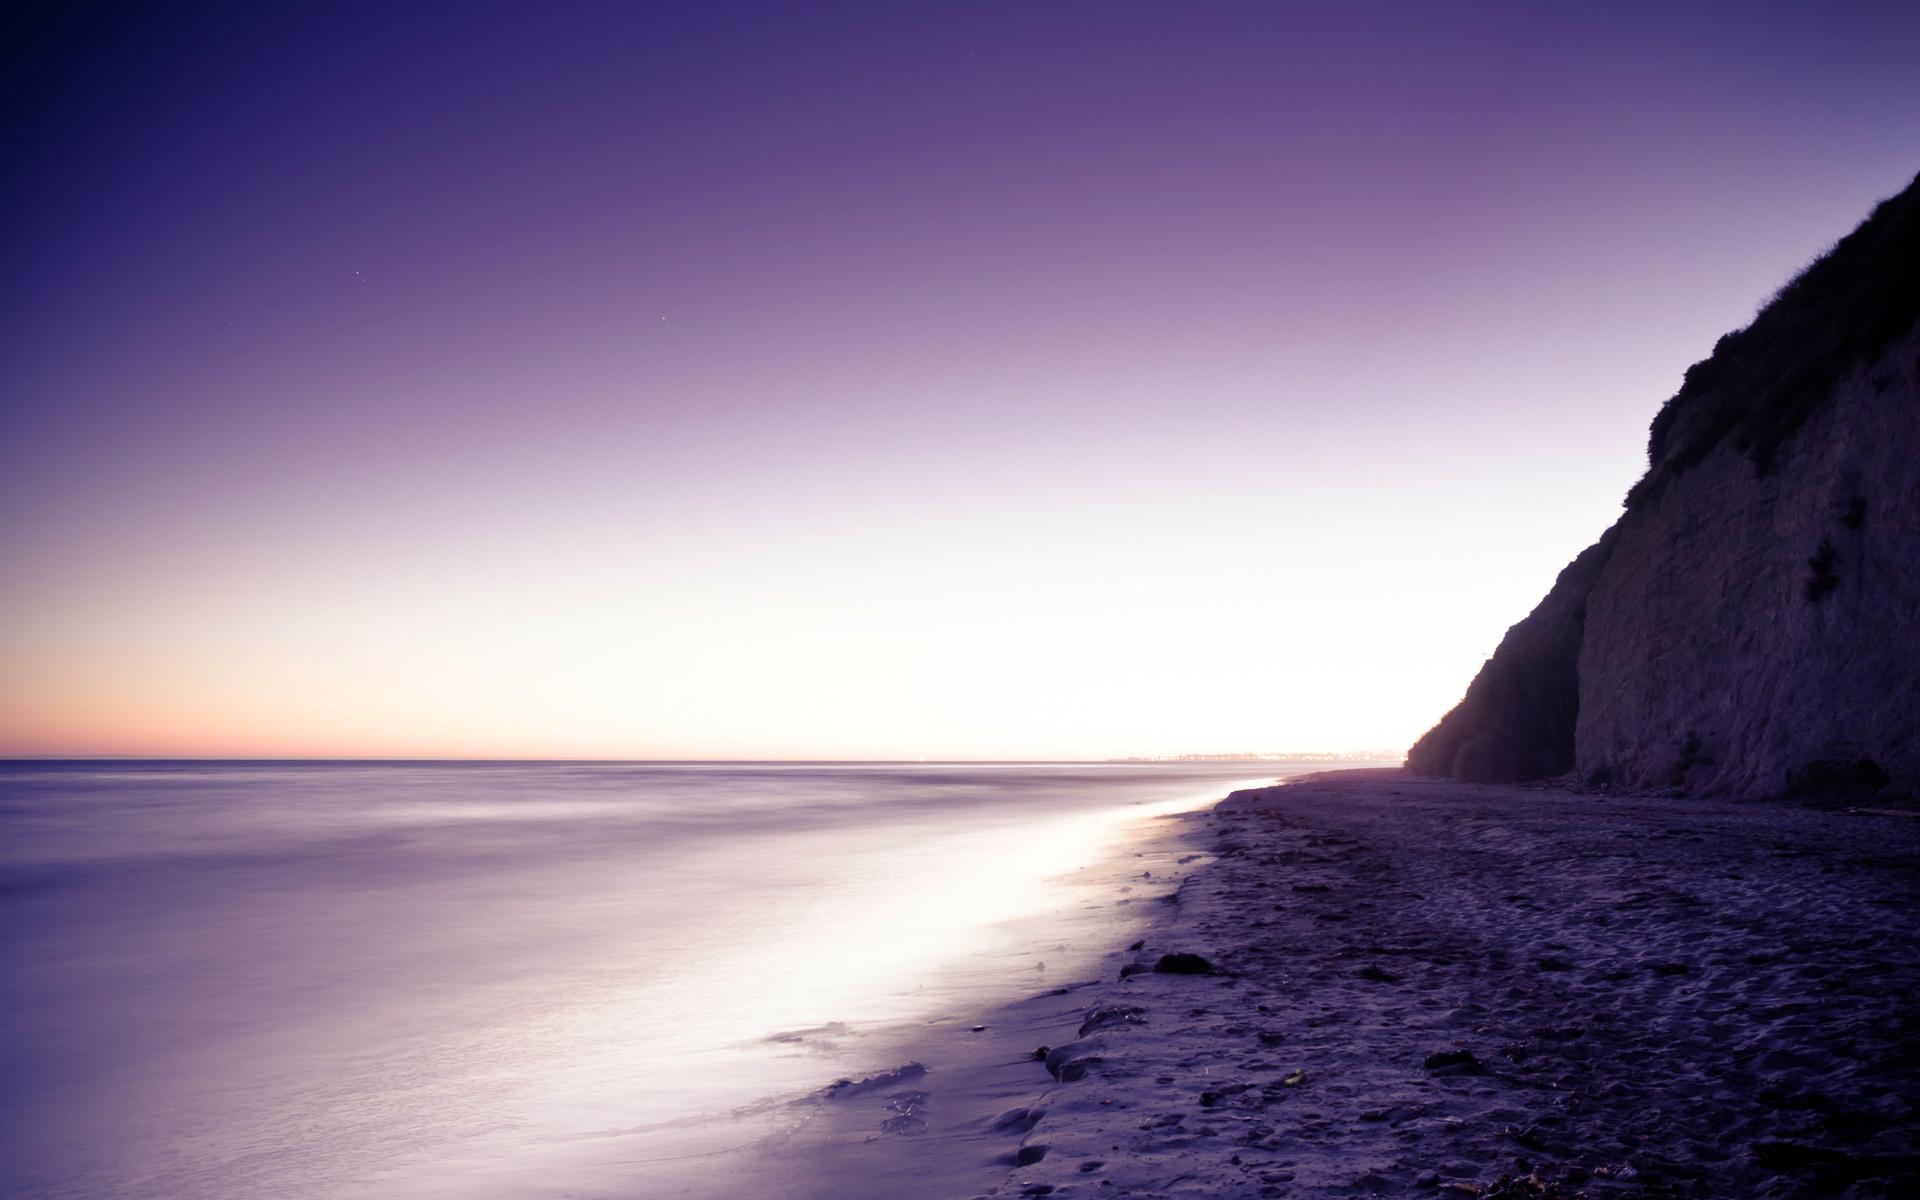 cliff wallpaper hd 37638